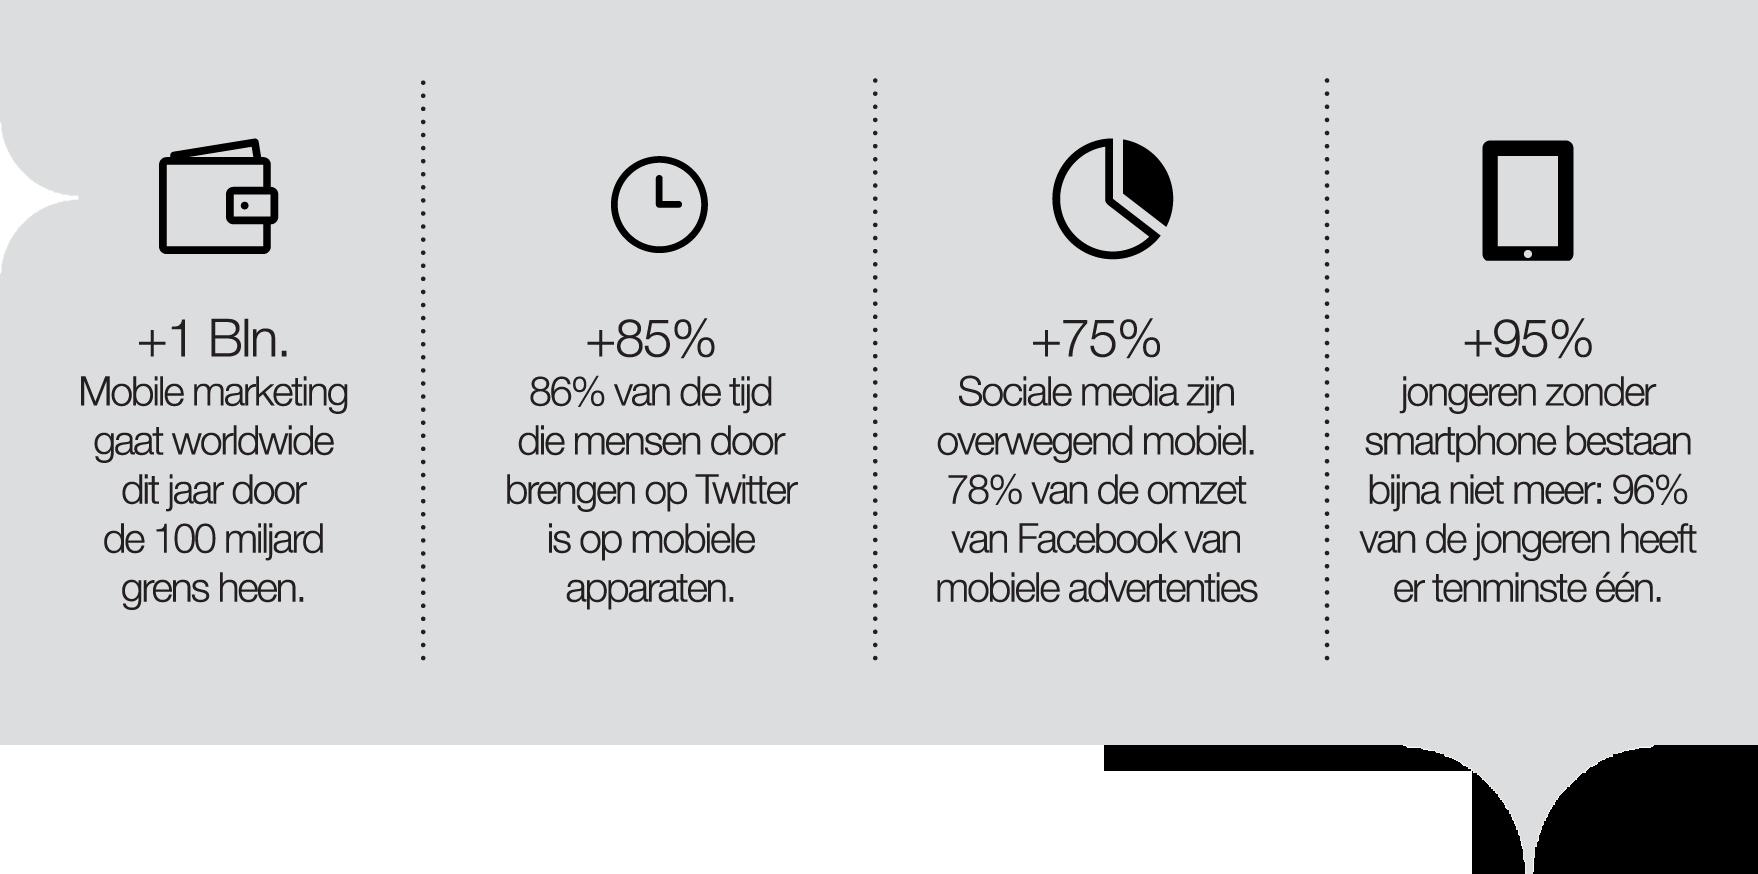 zomerinhuis.nlcommunicatie+score_mobile_only